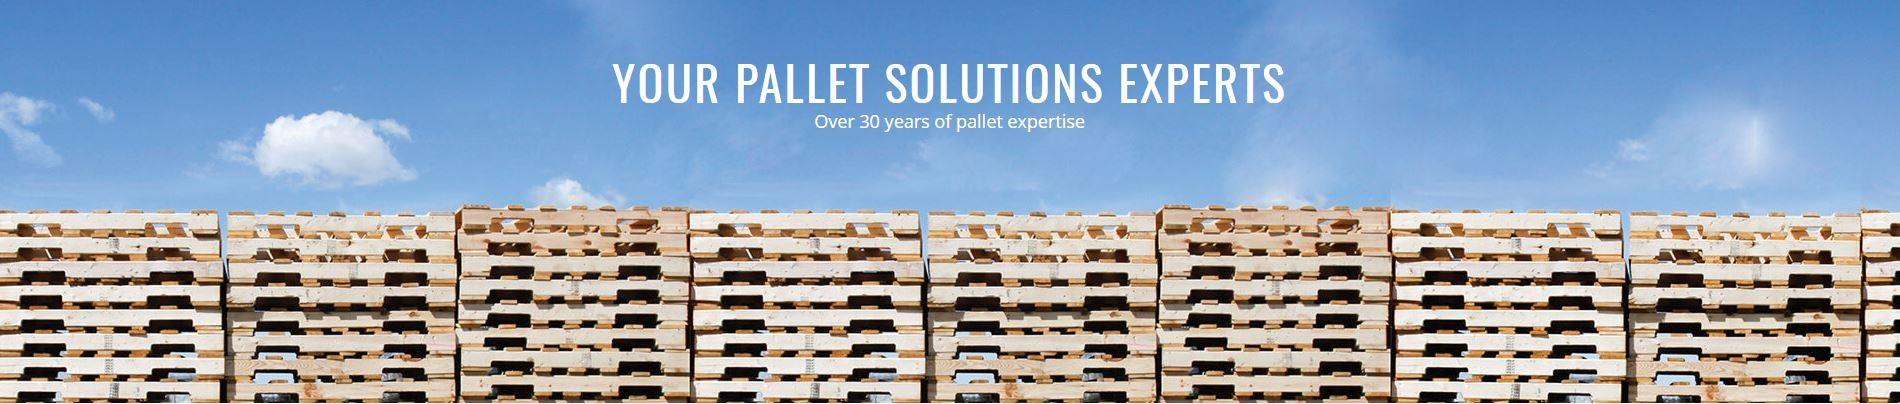 Northwest Pallet Services | LinkedIn